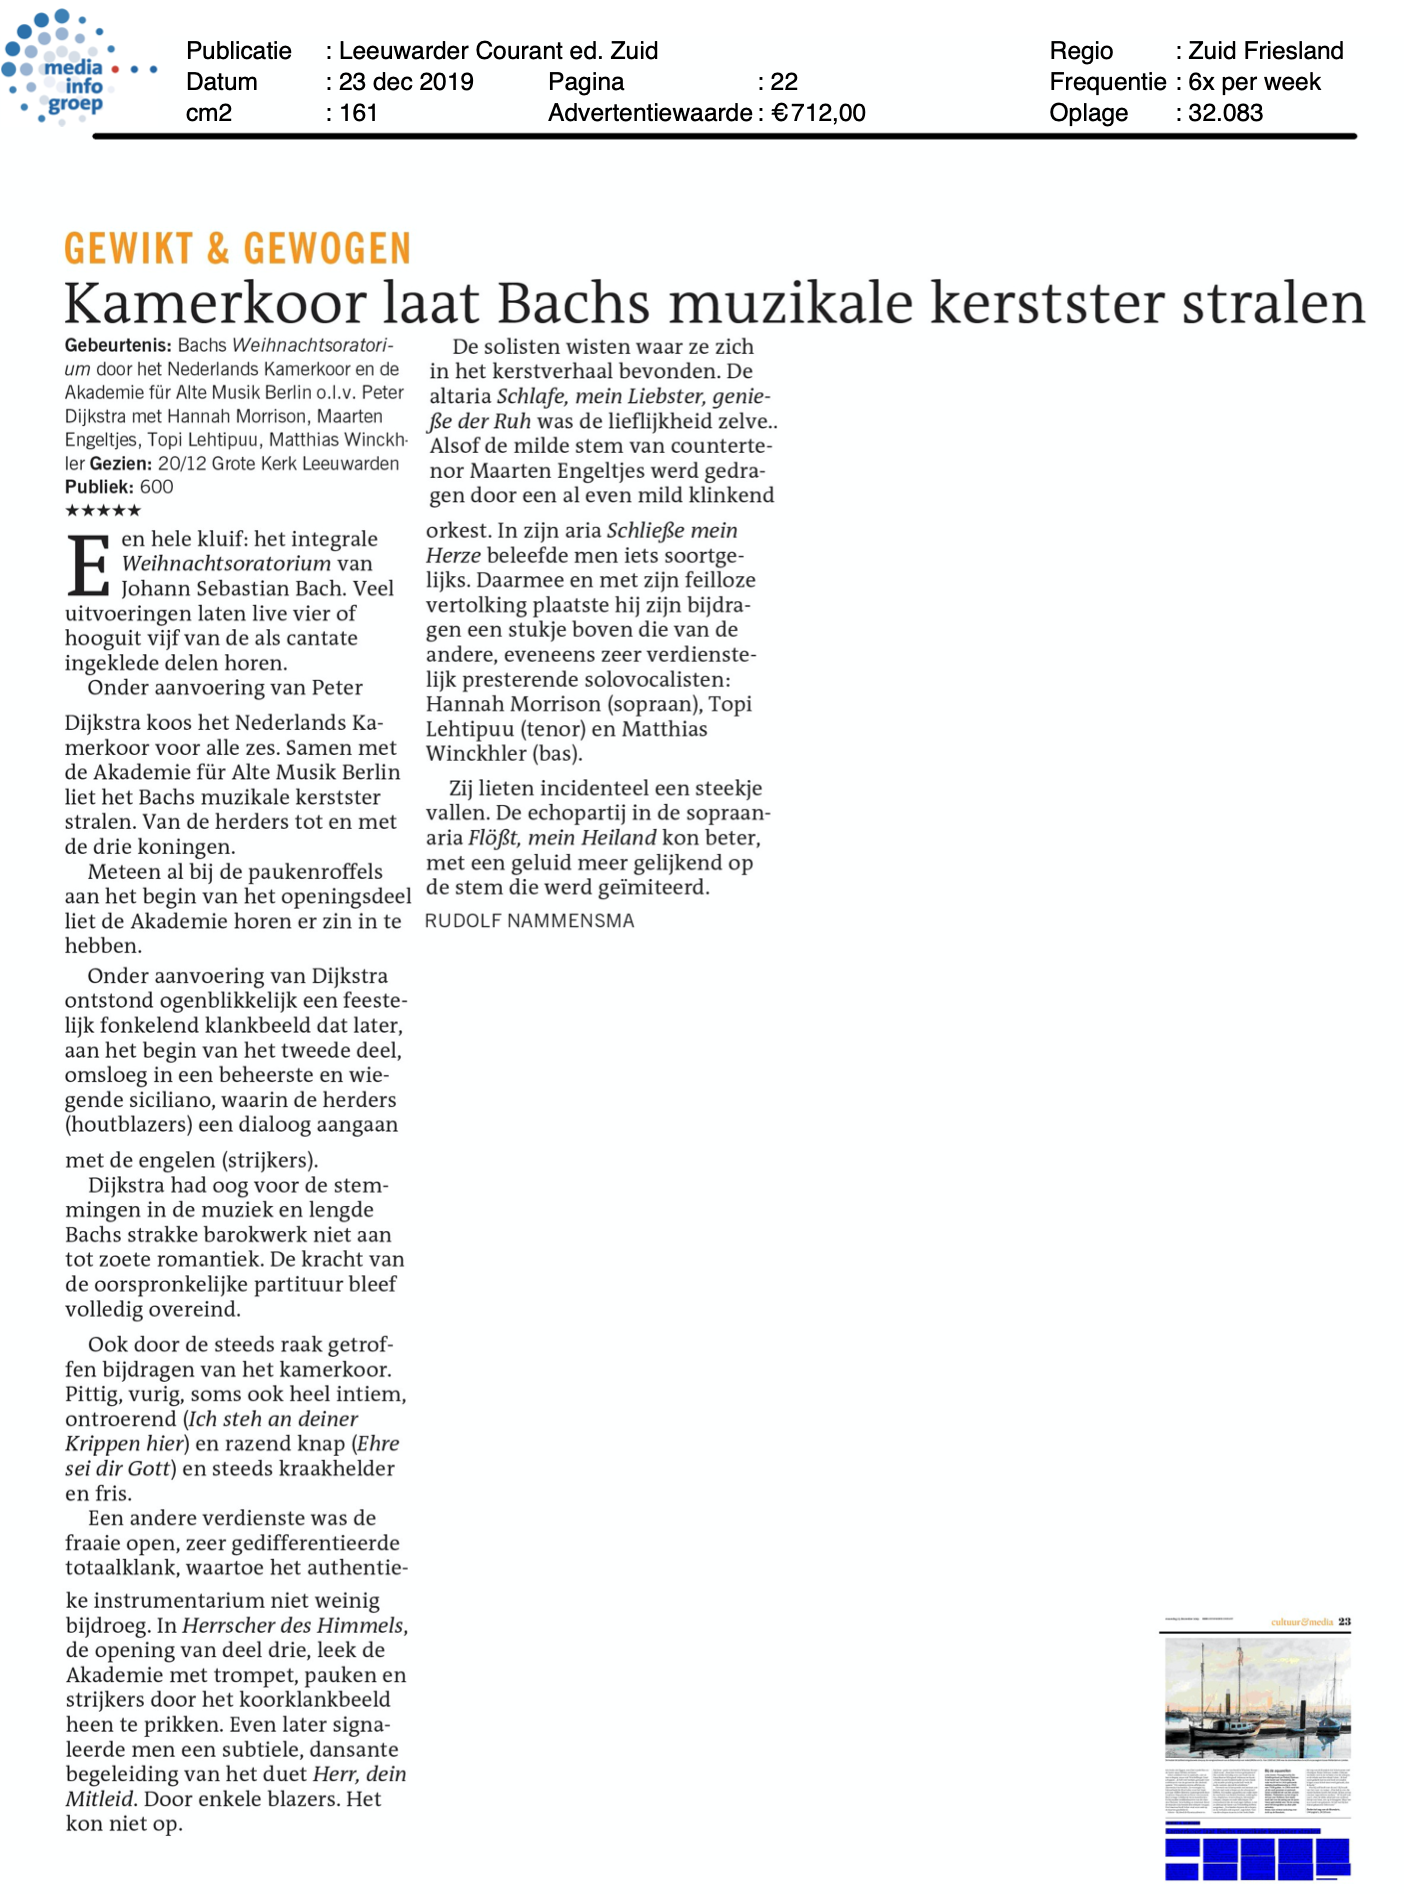 2019-12-23 Leeuwarder Courant : NKK